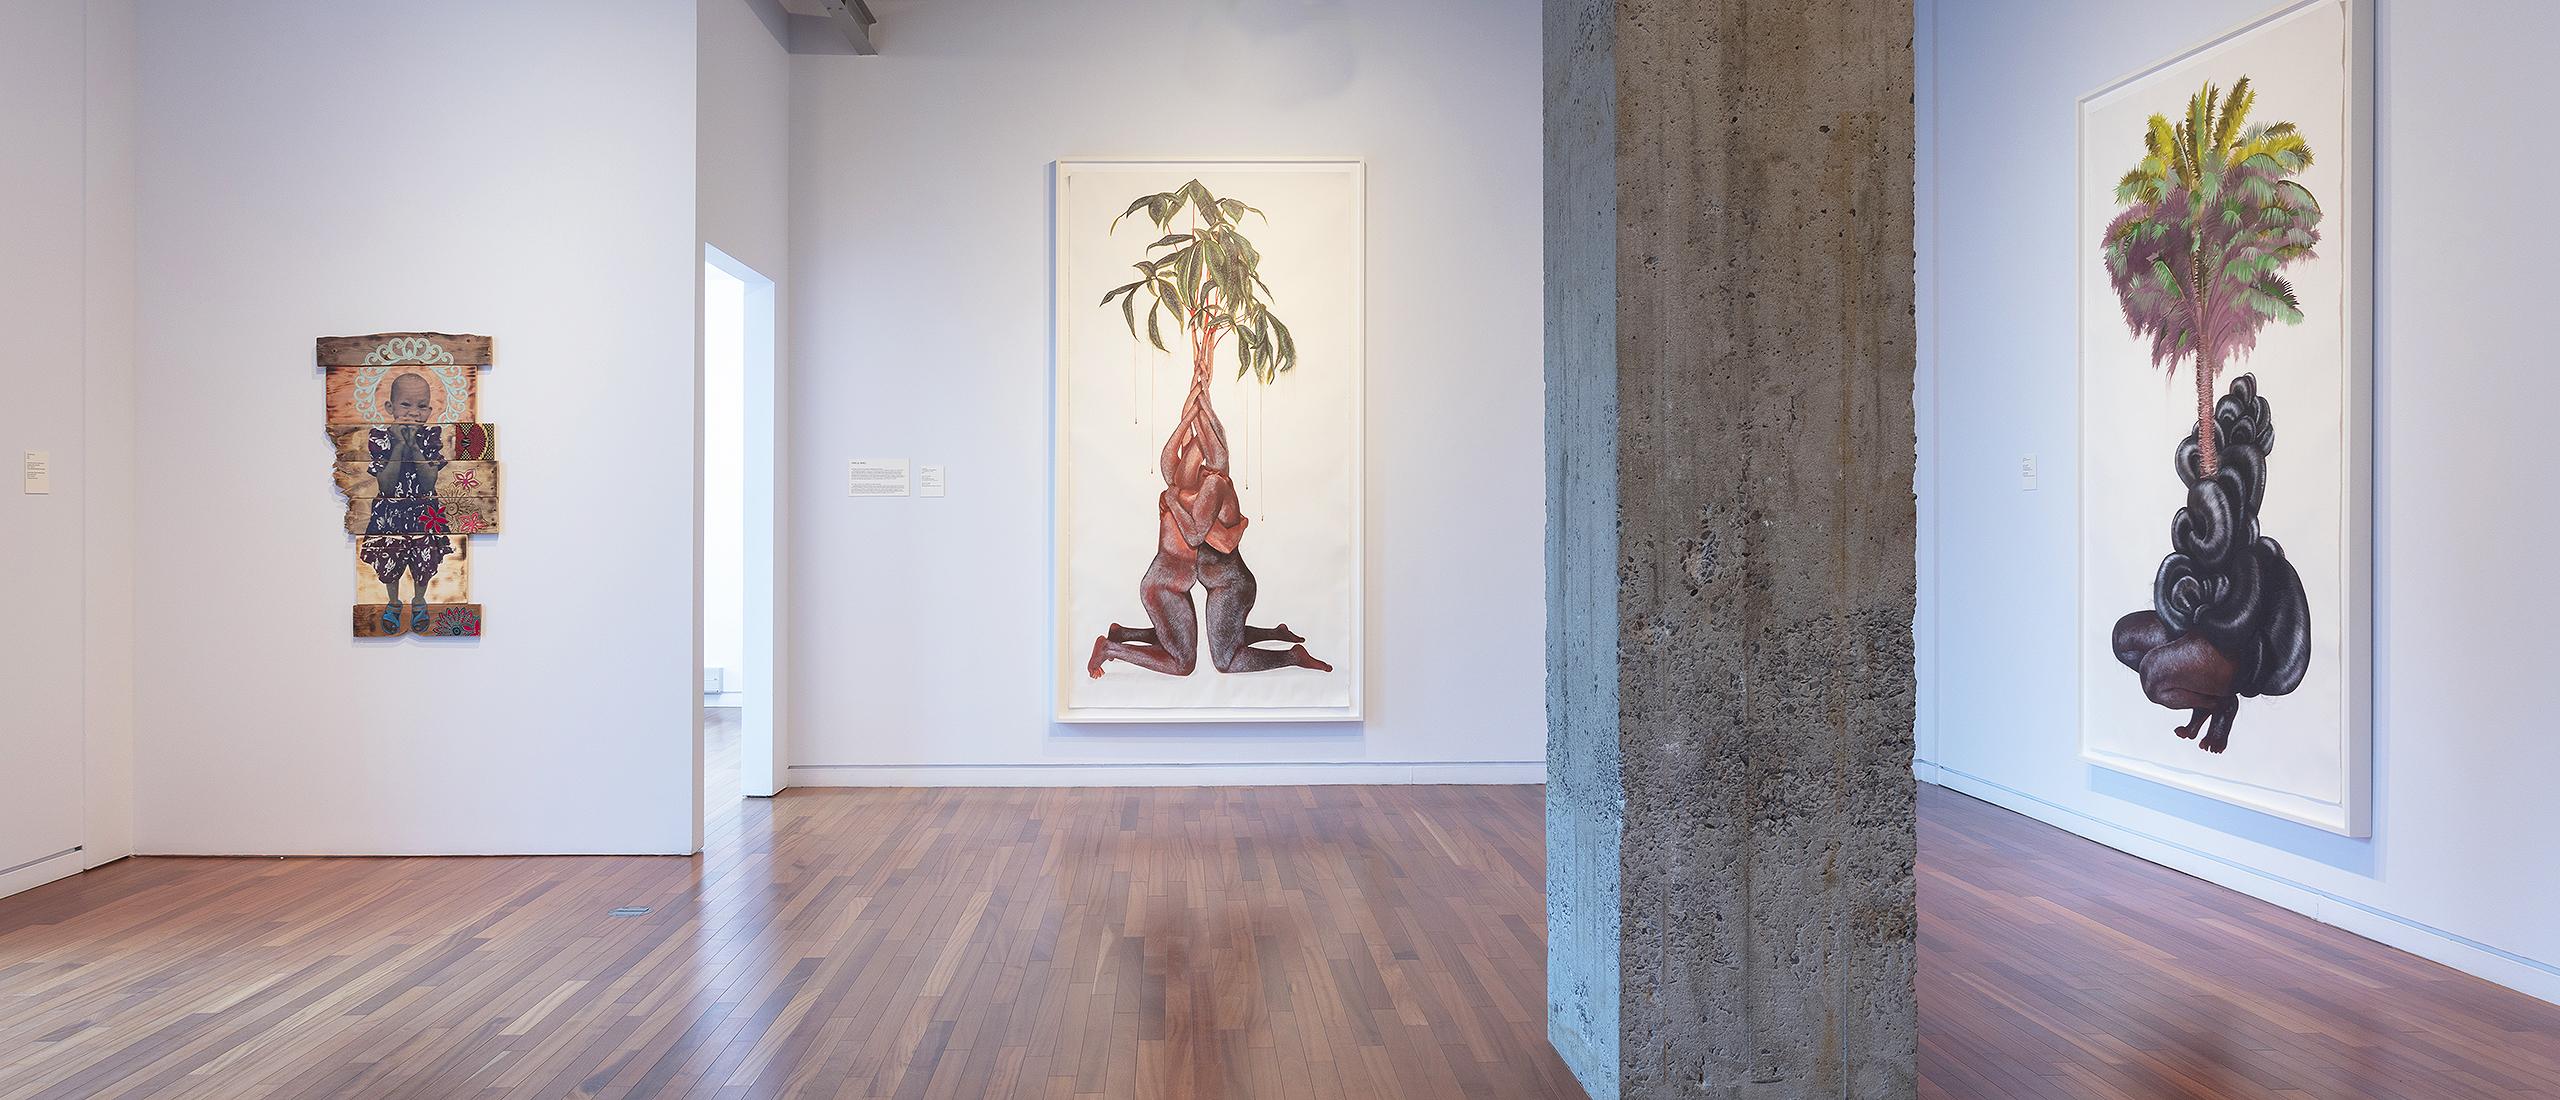 RELATIONS: Diaspora and Painting